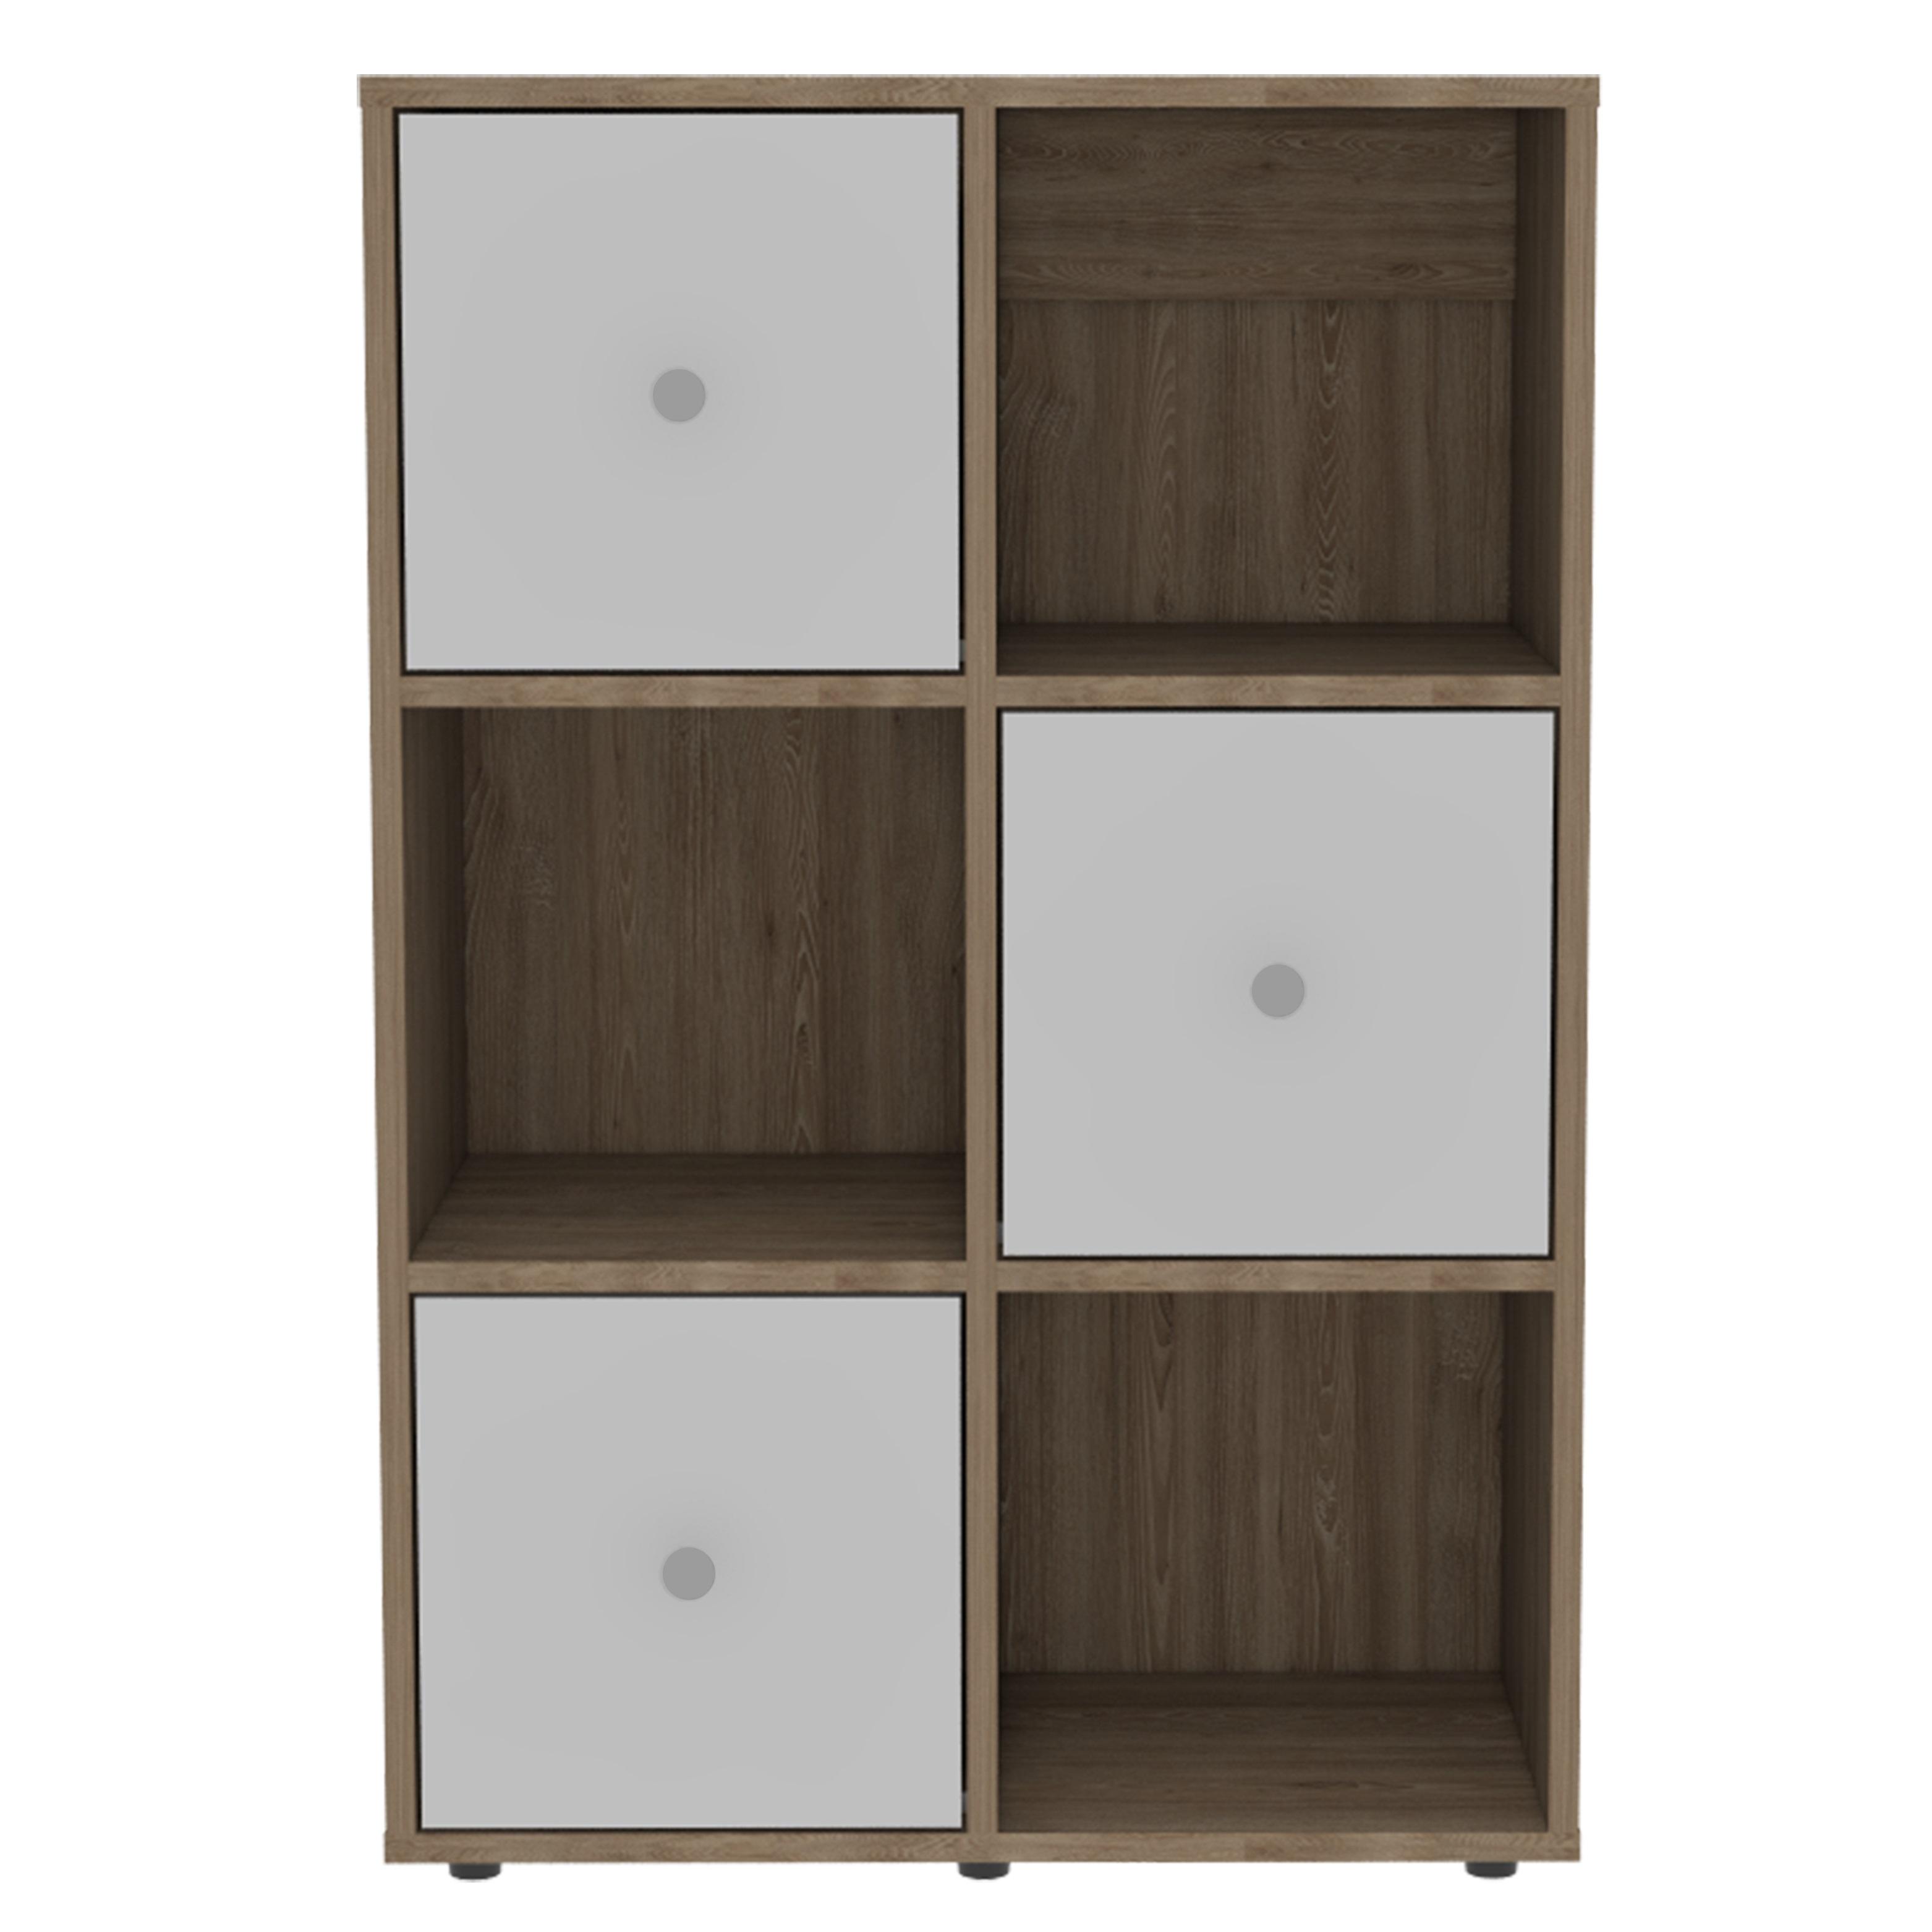 Mueble organizador modelo Vega 89.6cm x 59.3cm x 28.6cm color miel/blanco RTA